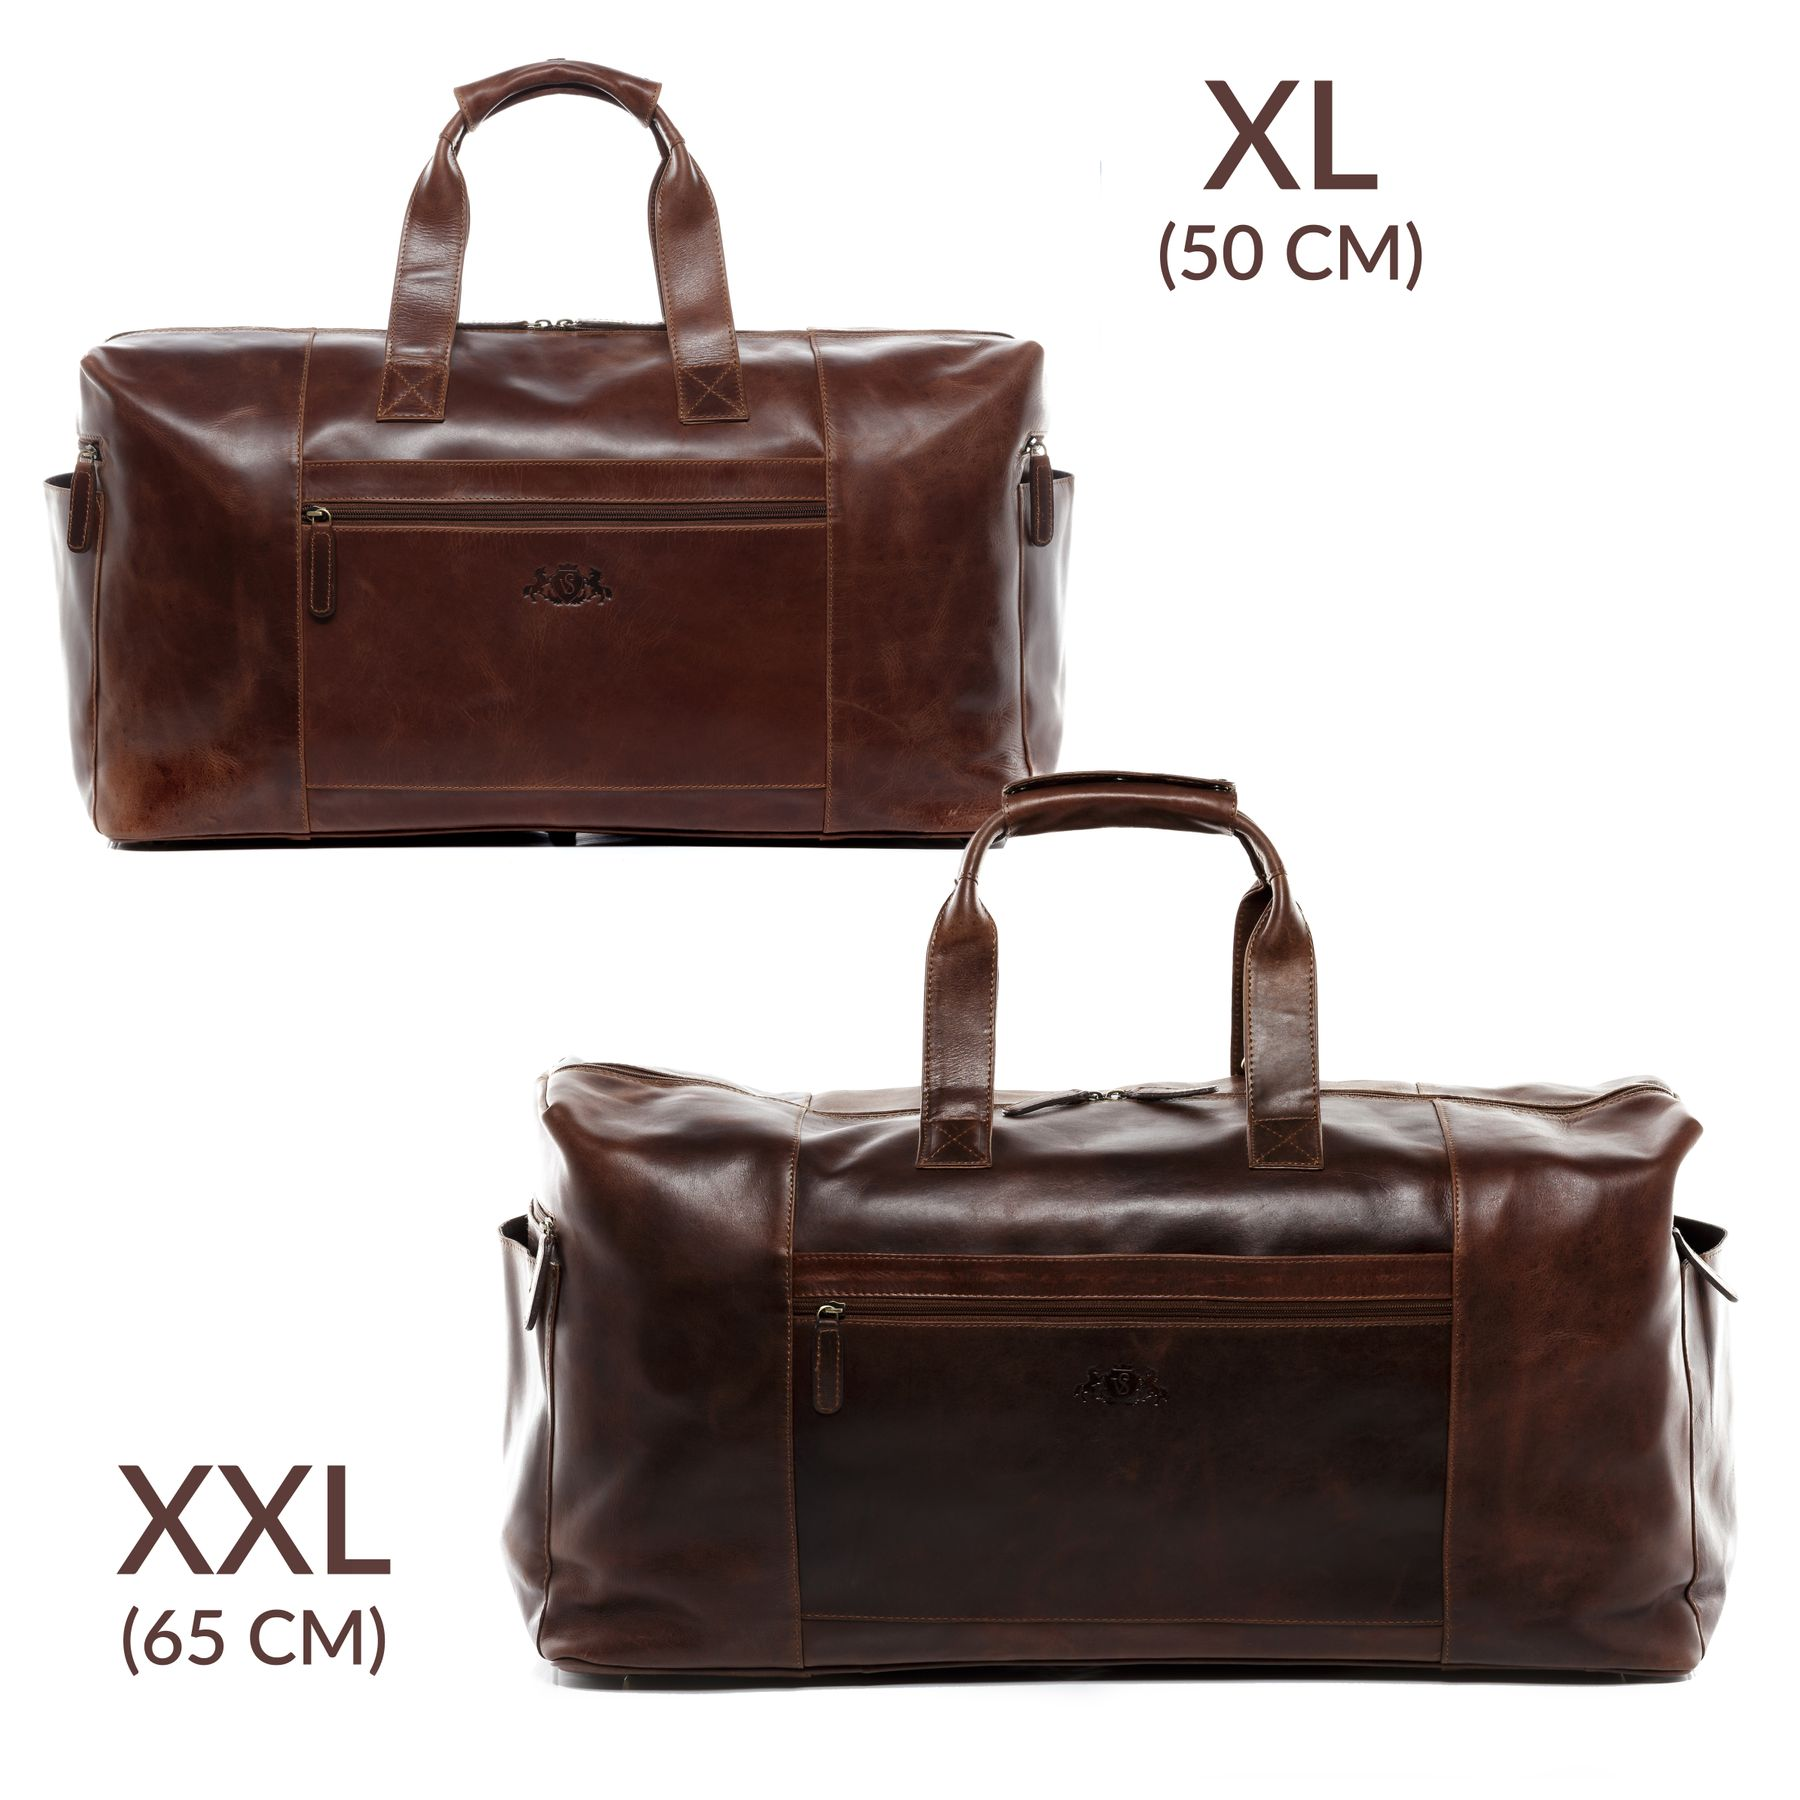 SID   VAIN sac de voyage cuir marron fourre-tout besace week-end sac ... 8cd419e2a4a